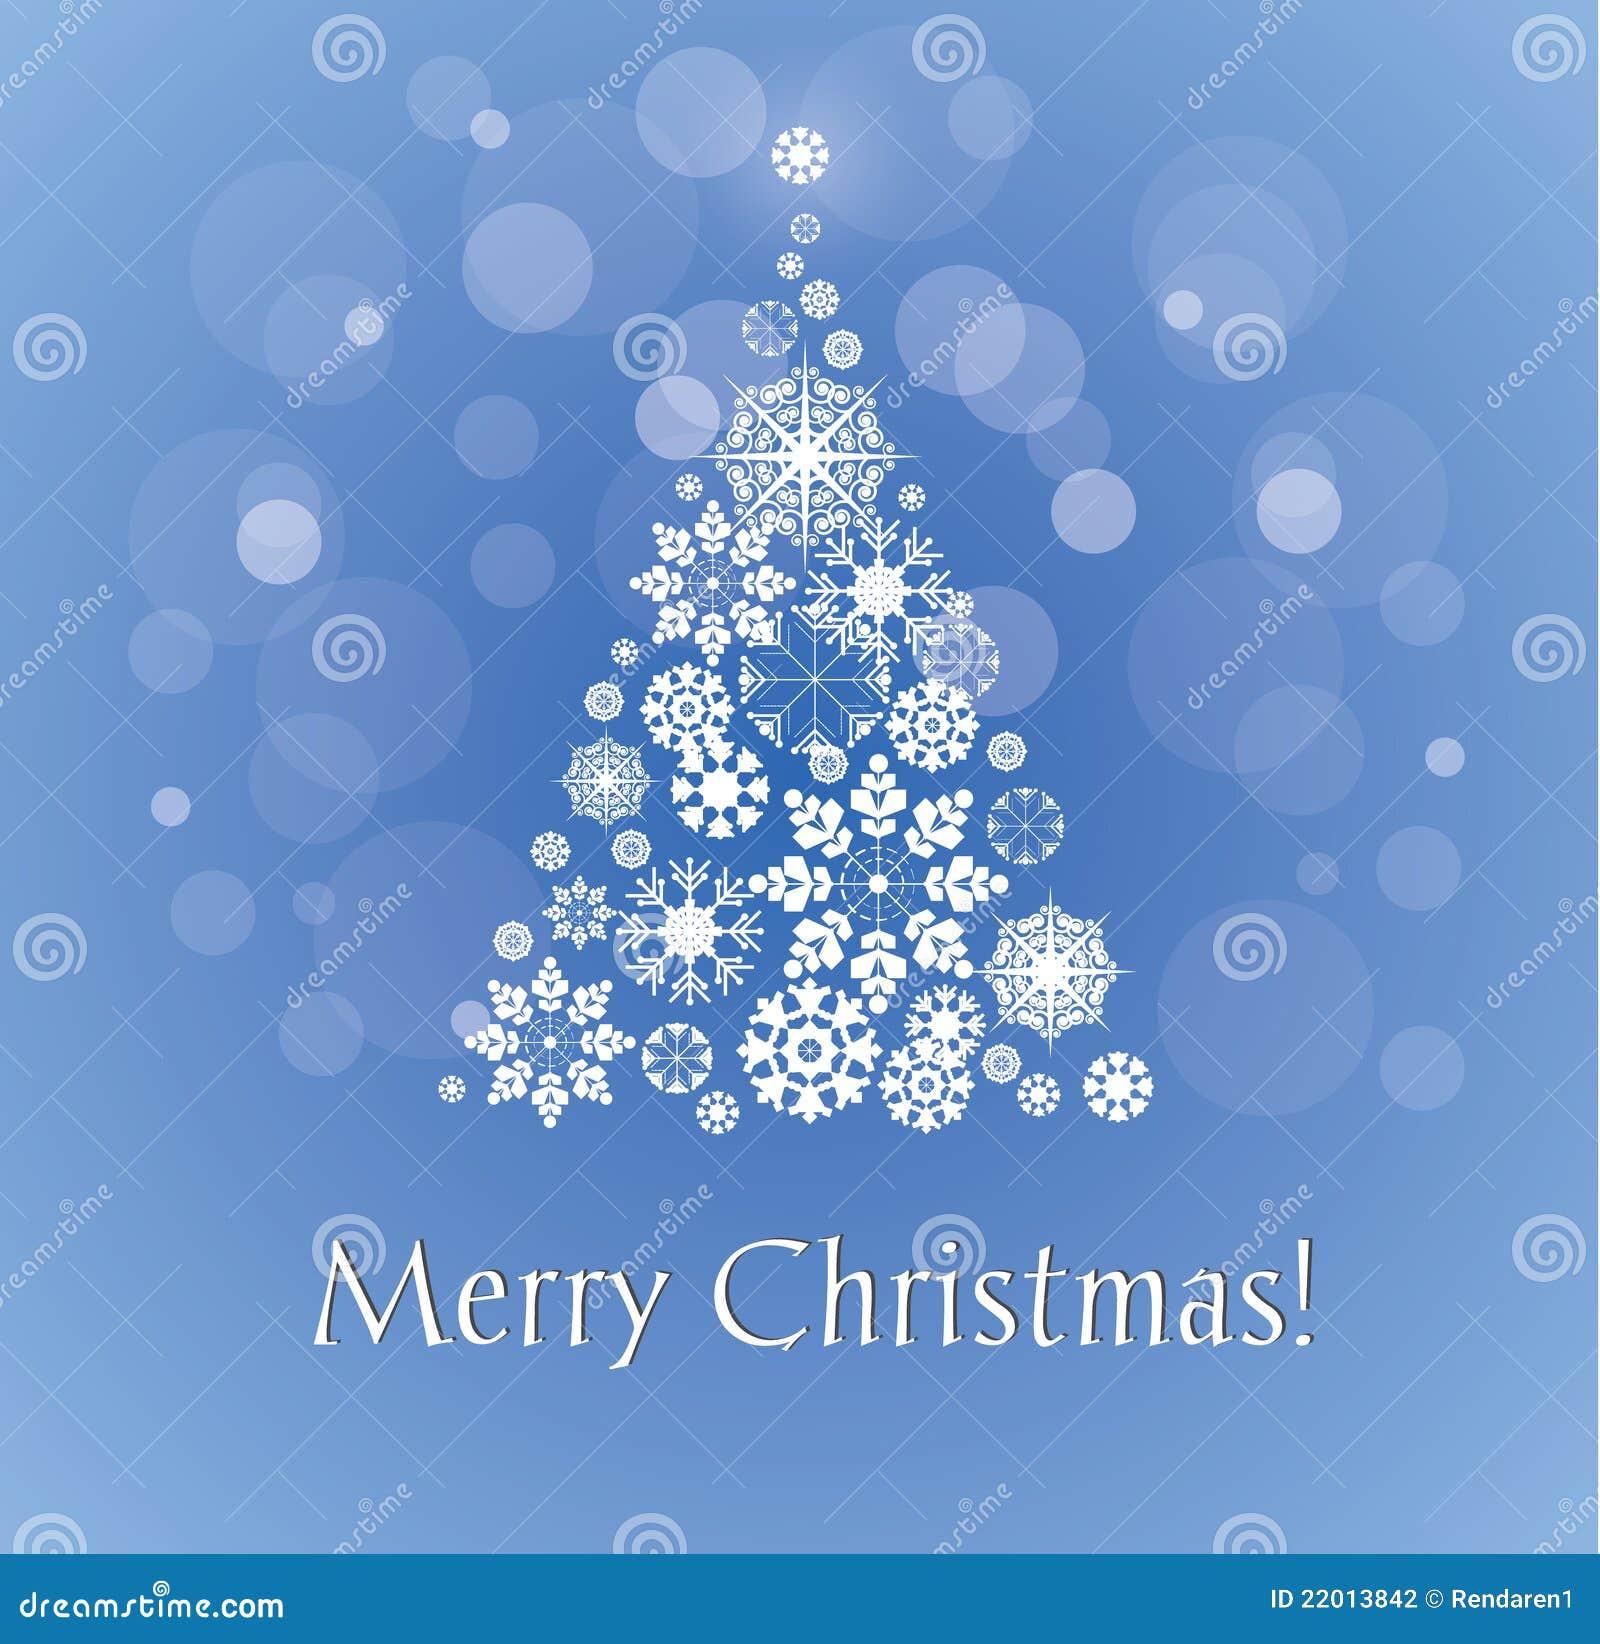 Merry Christmas Card With Snowy Christmas Tree Stock Vector